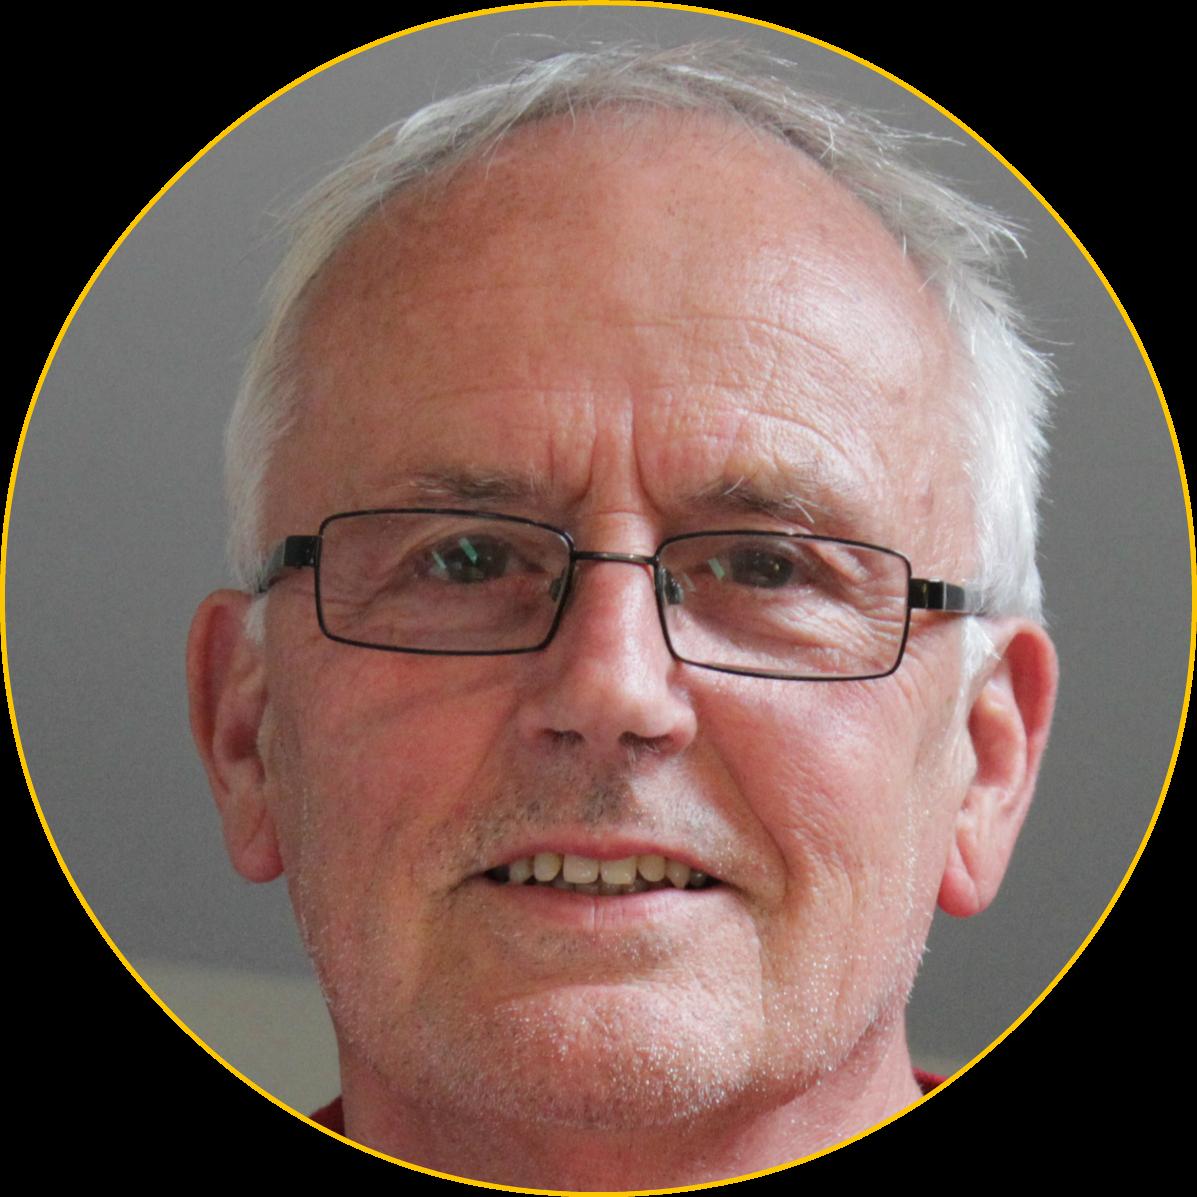 Bob Sydenham